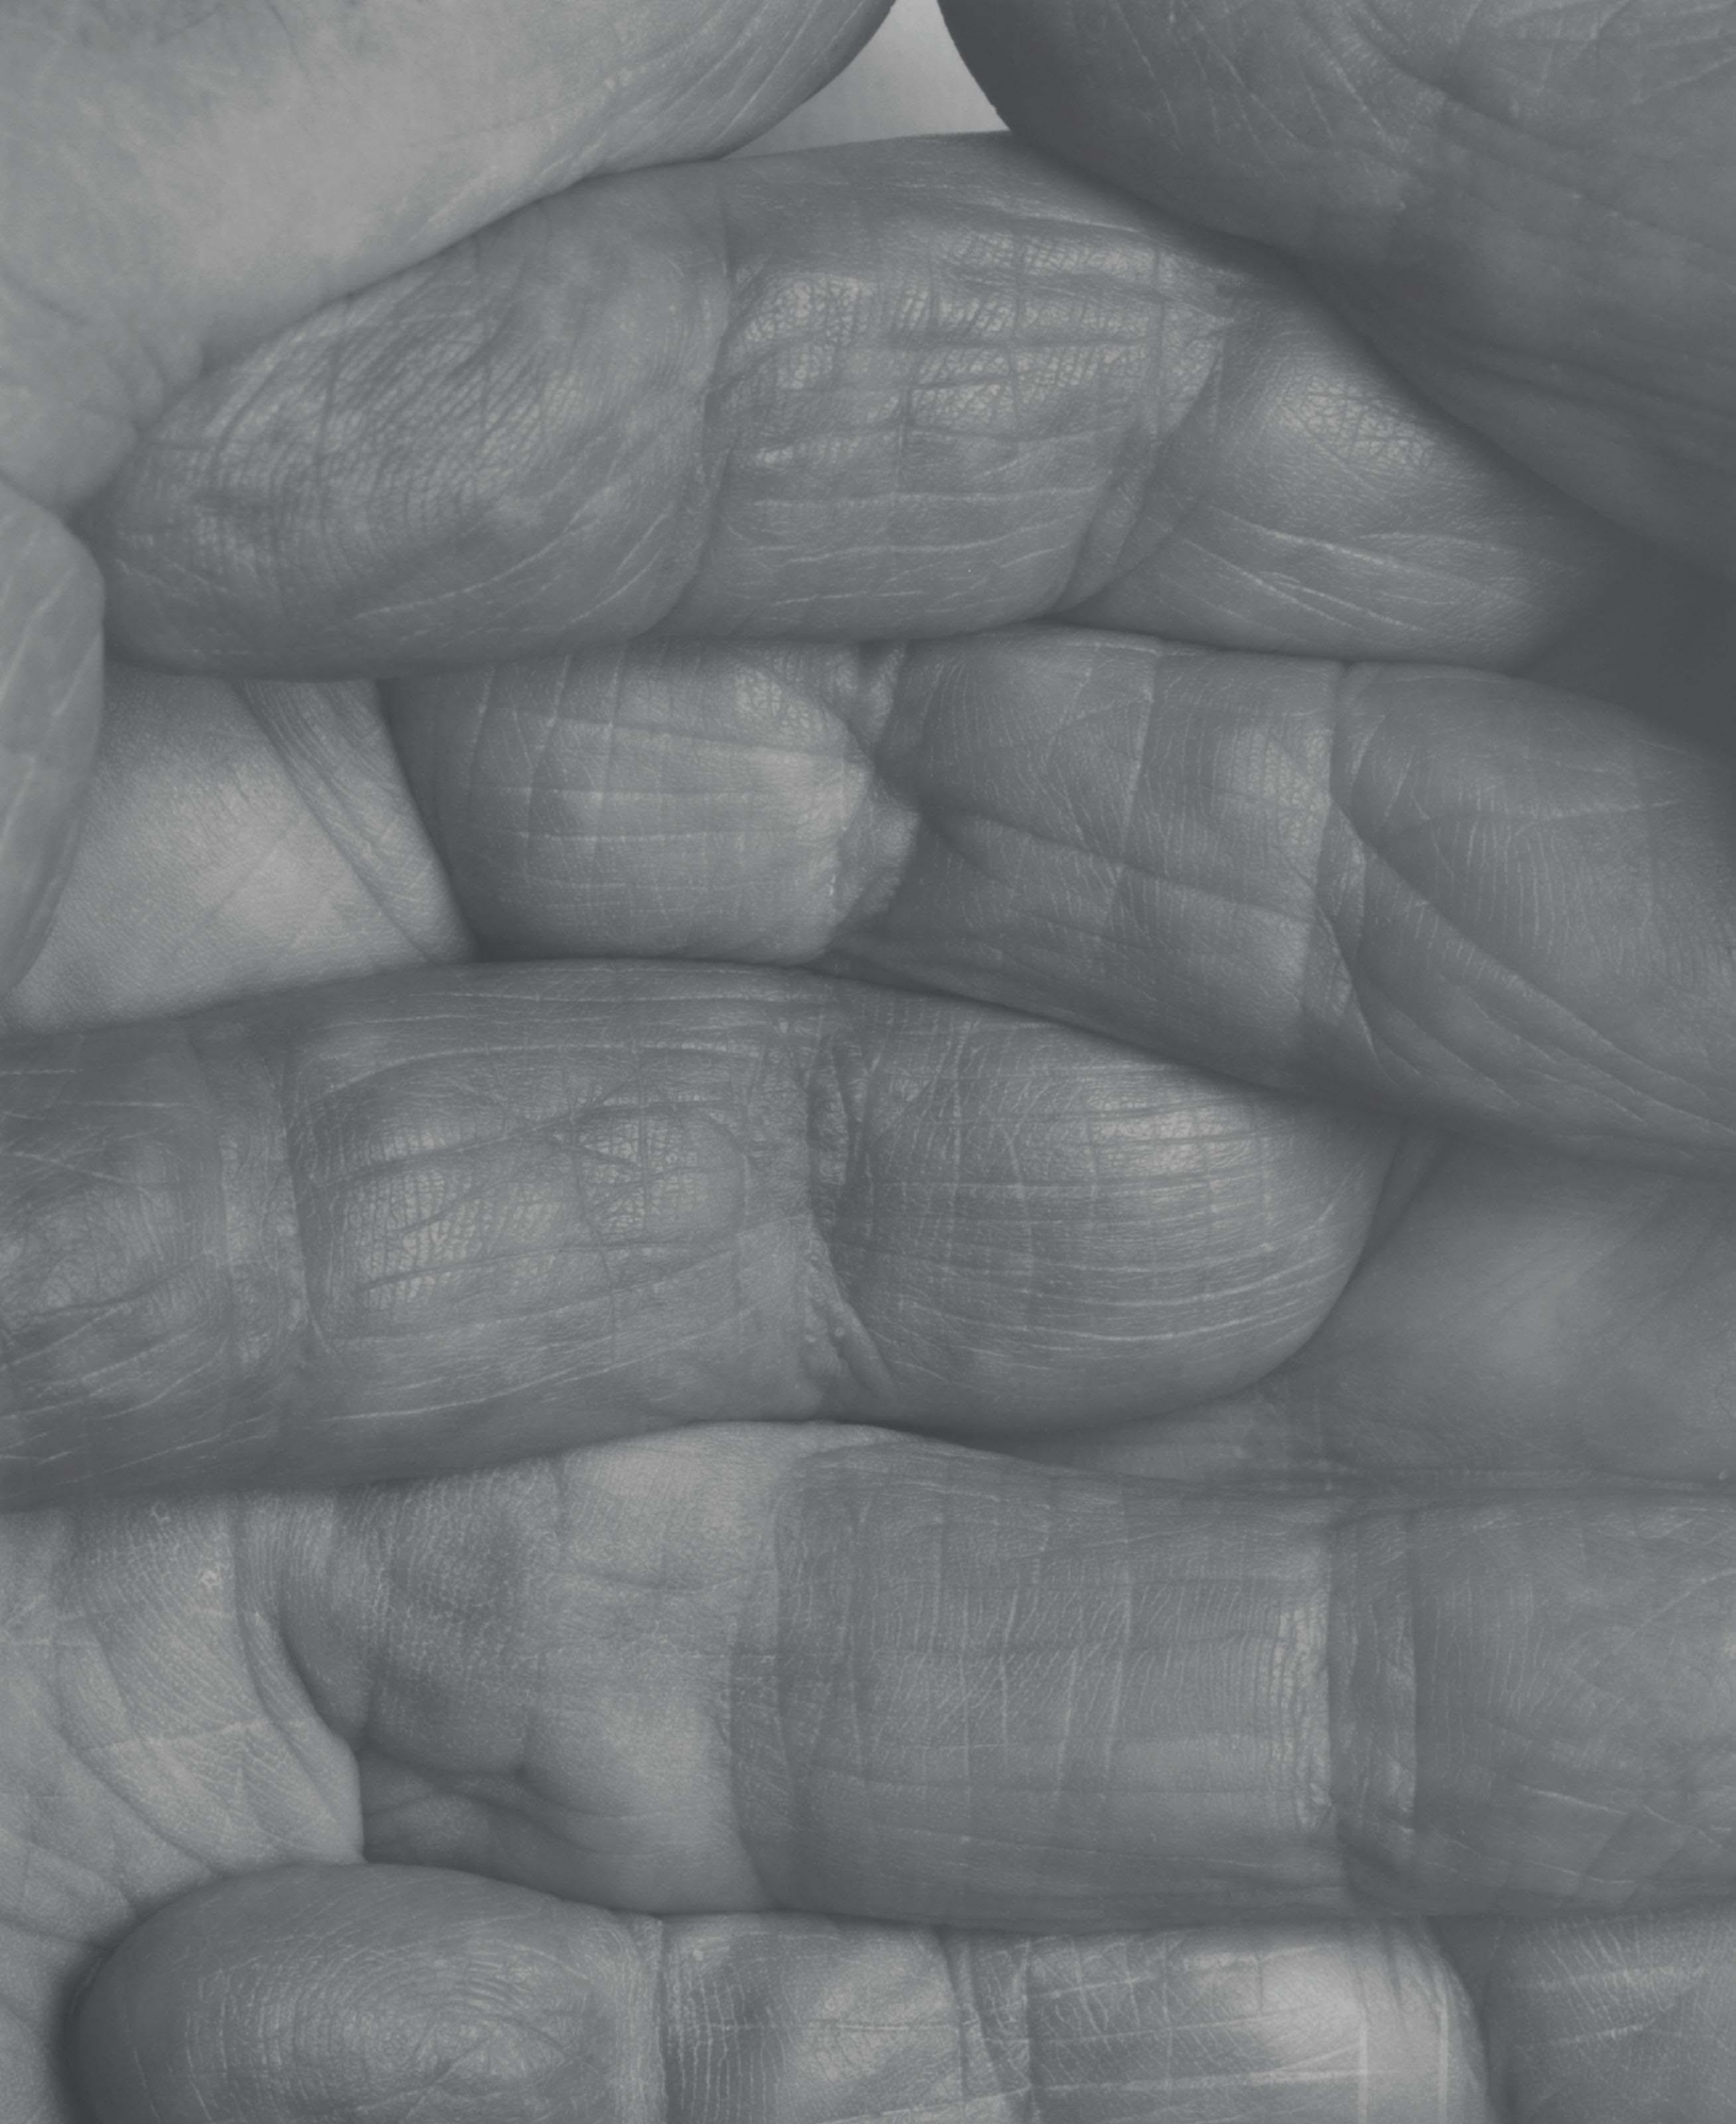 Self Portrait Interlocking fingers, No 1, 1999